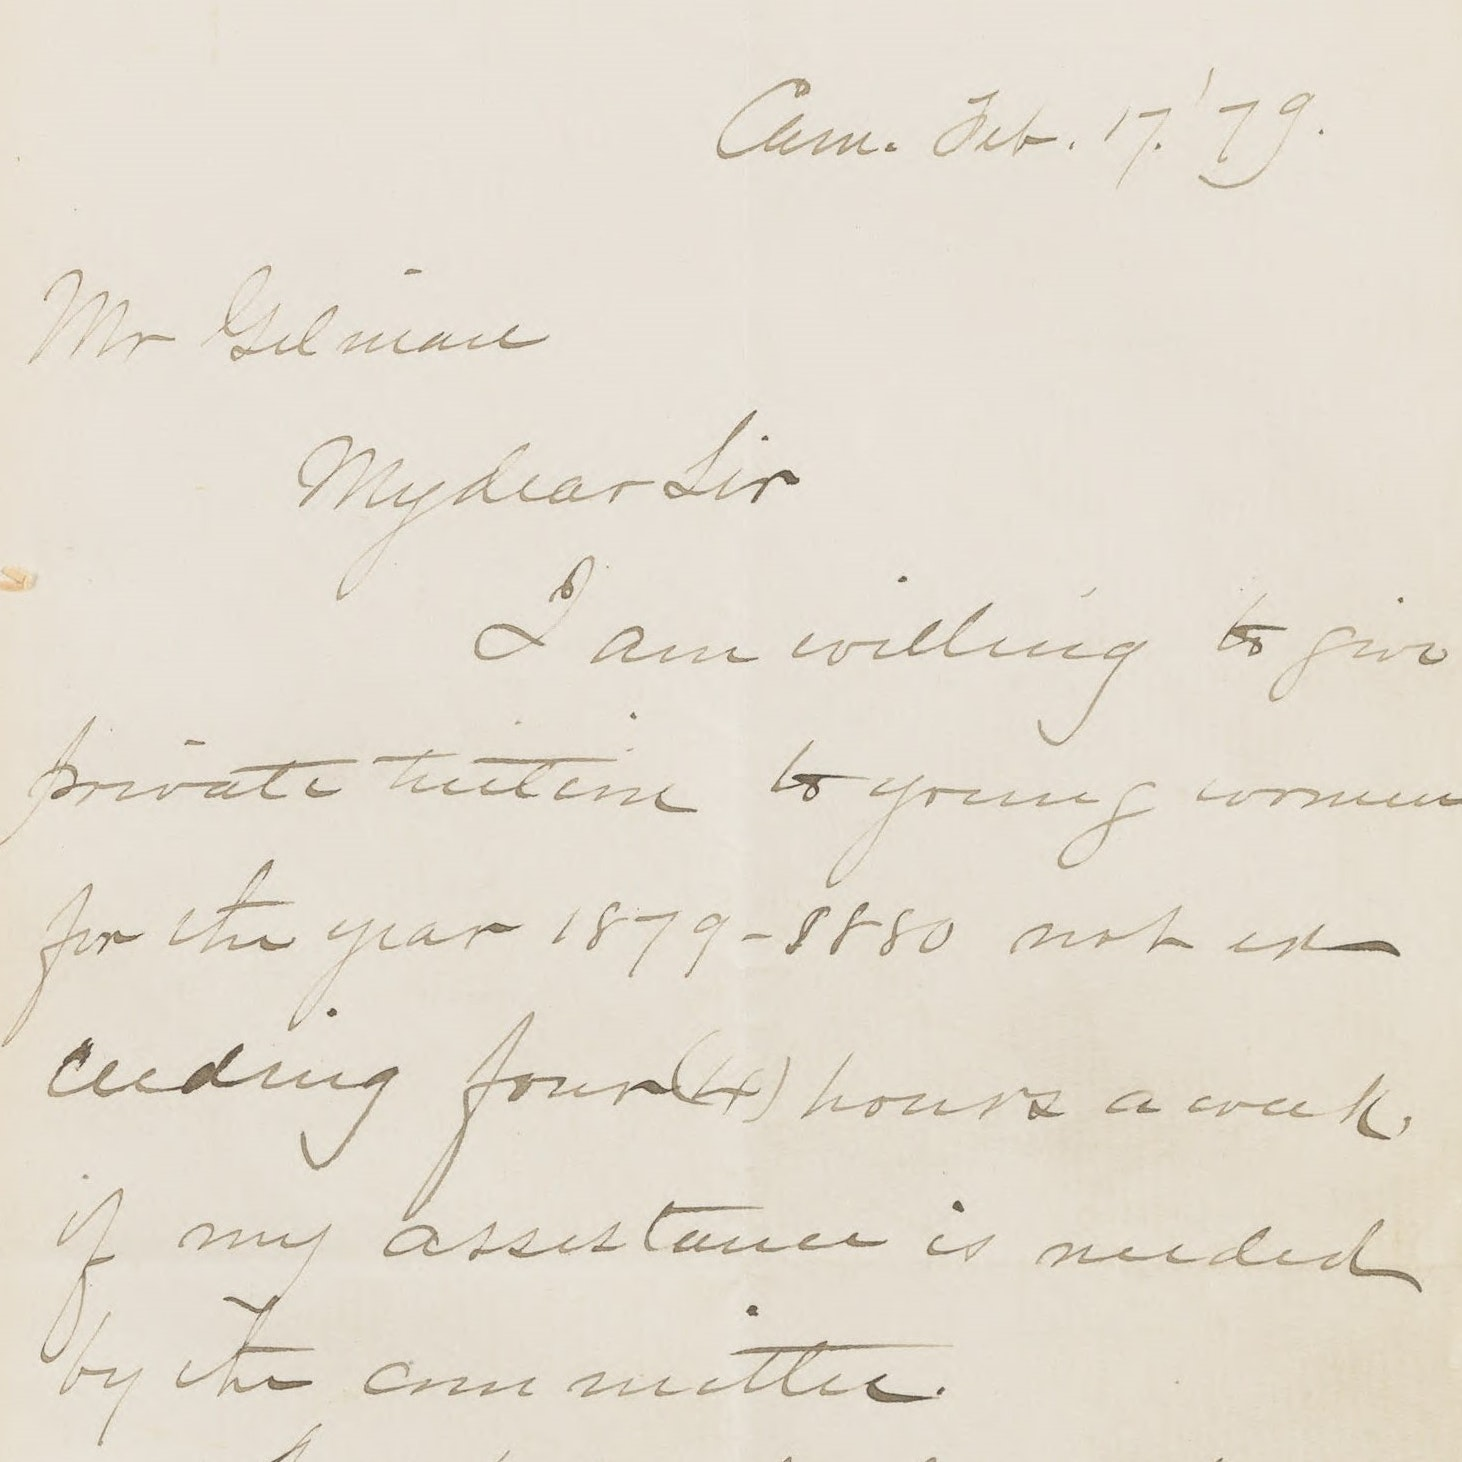 Letter to Arthur Gilman